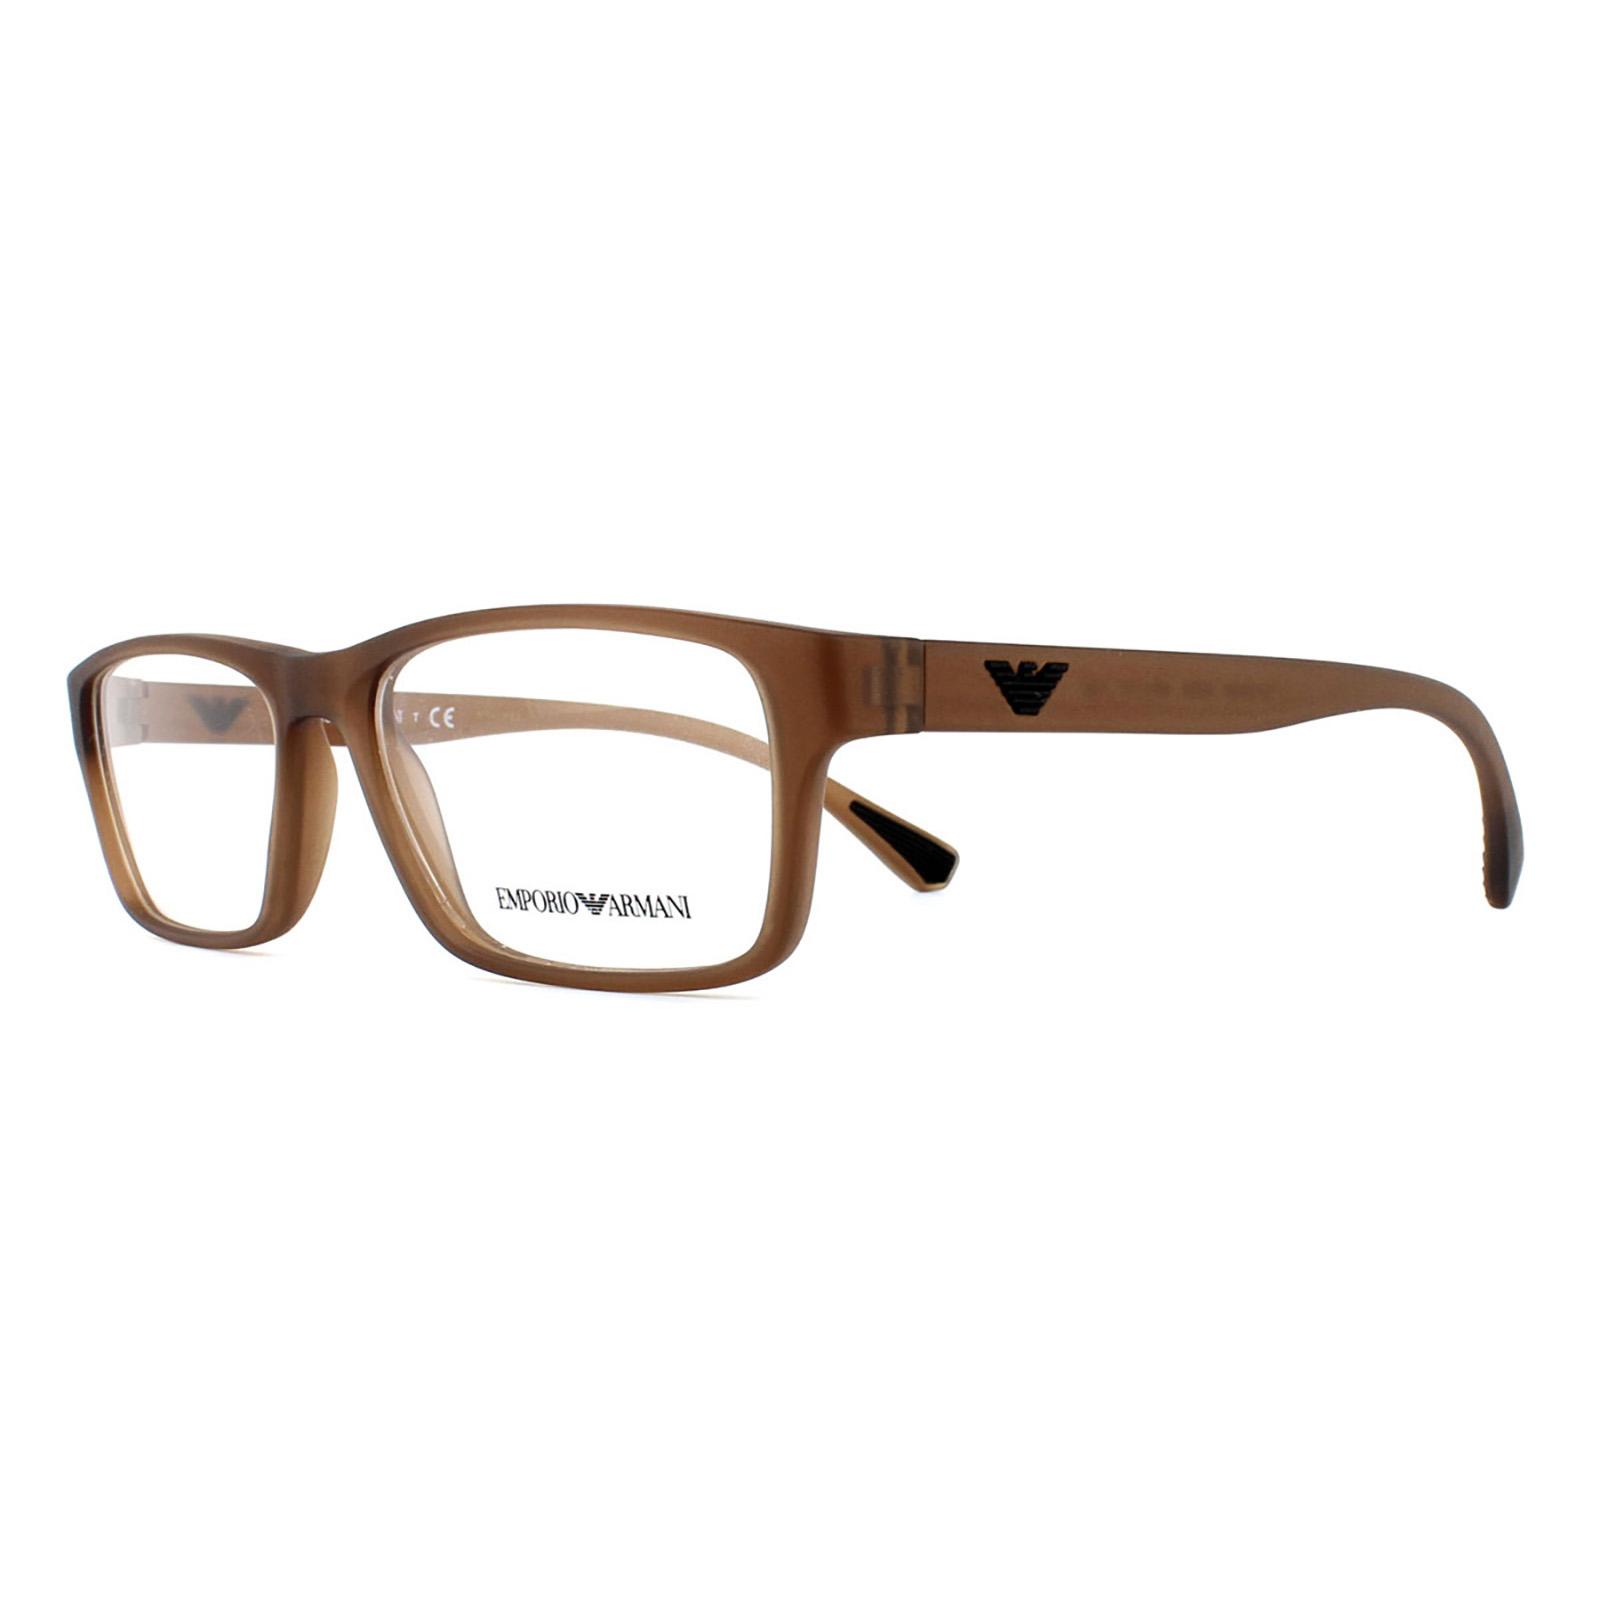 efd3cbc80595 Sentinel Emporio Armani Glasses Frames 3088 5533 Matte Transparent Brown  Men 55mm